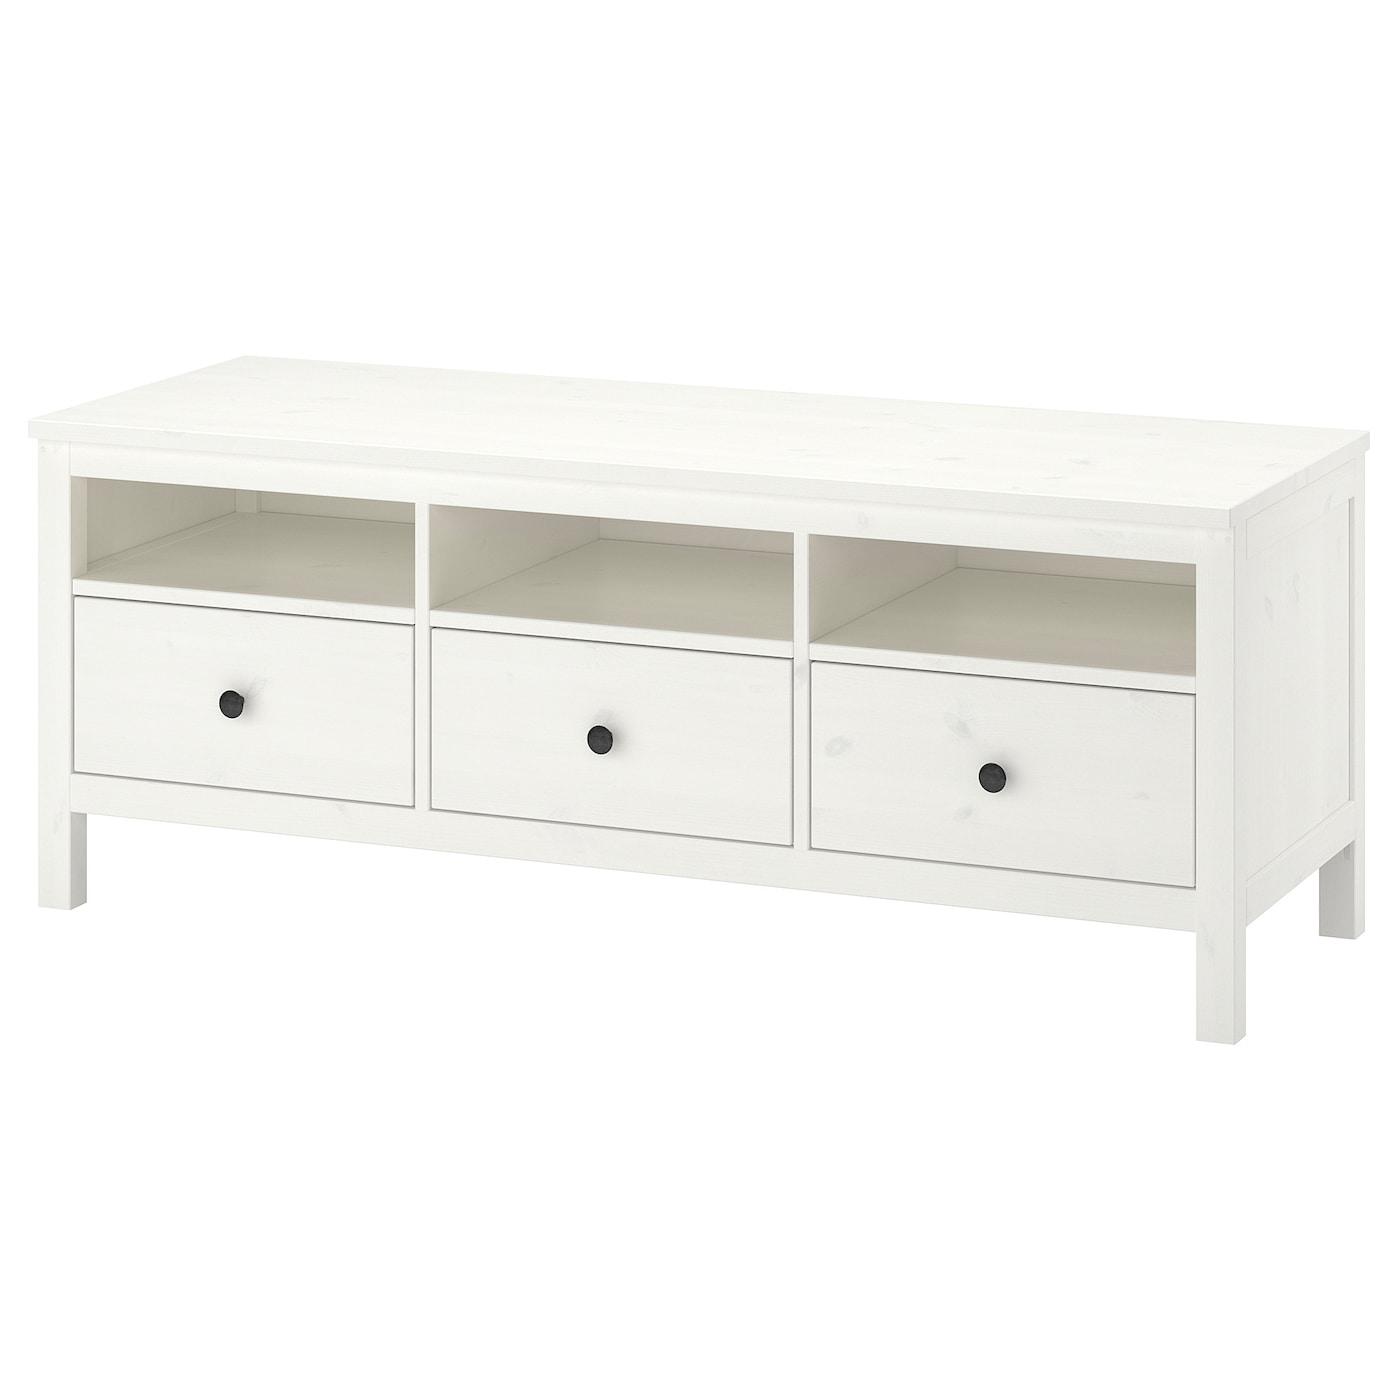 tv meubel ikea. Black Bedroom Furniture Sets. Home Design Ideas